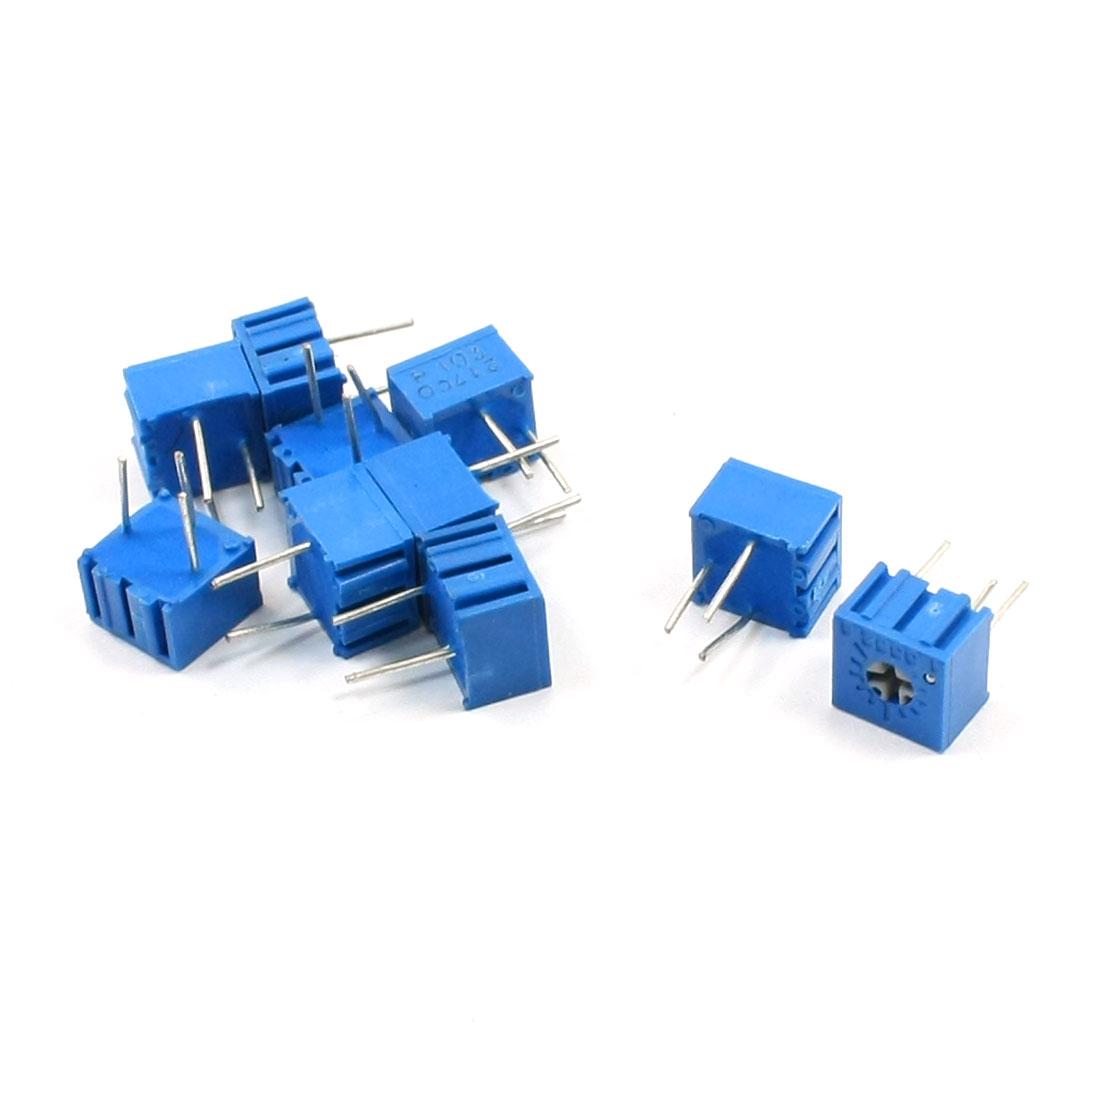 10pcs 10K Ohm Trimmer Pot Potentiometer Variable Resistors 3362P-103